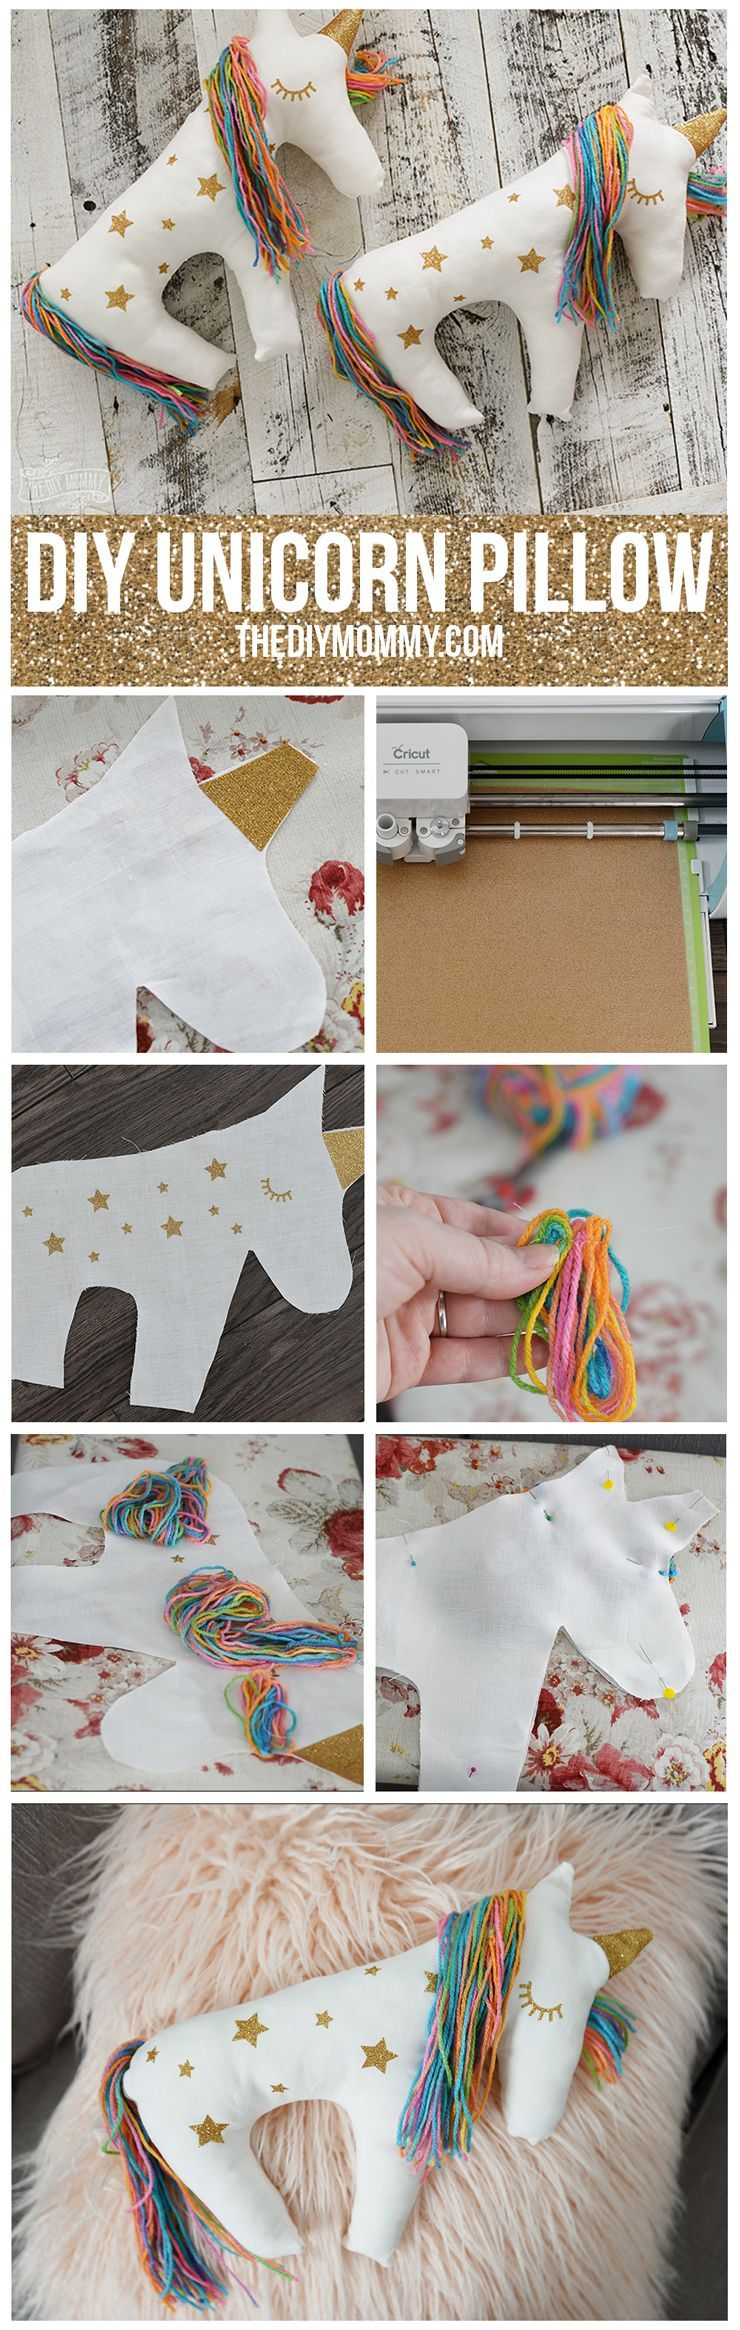 Diy unicorn plush pillow free pattern and tutorial secret santa